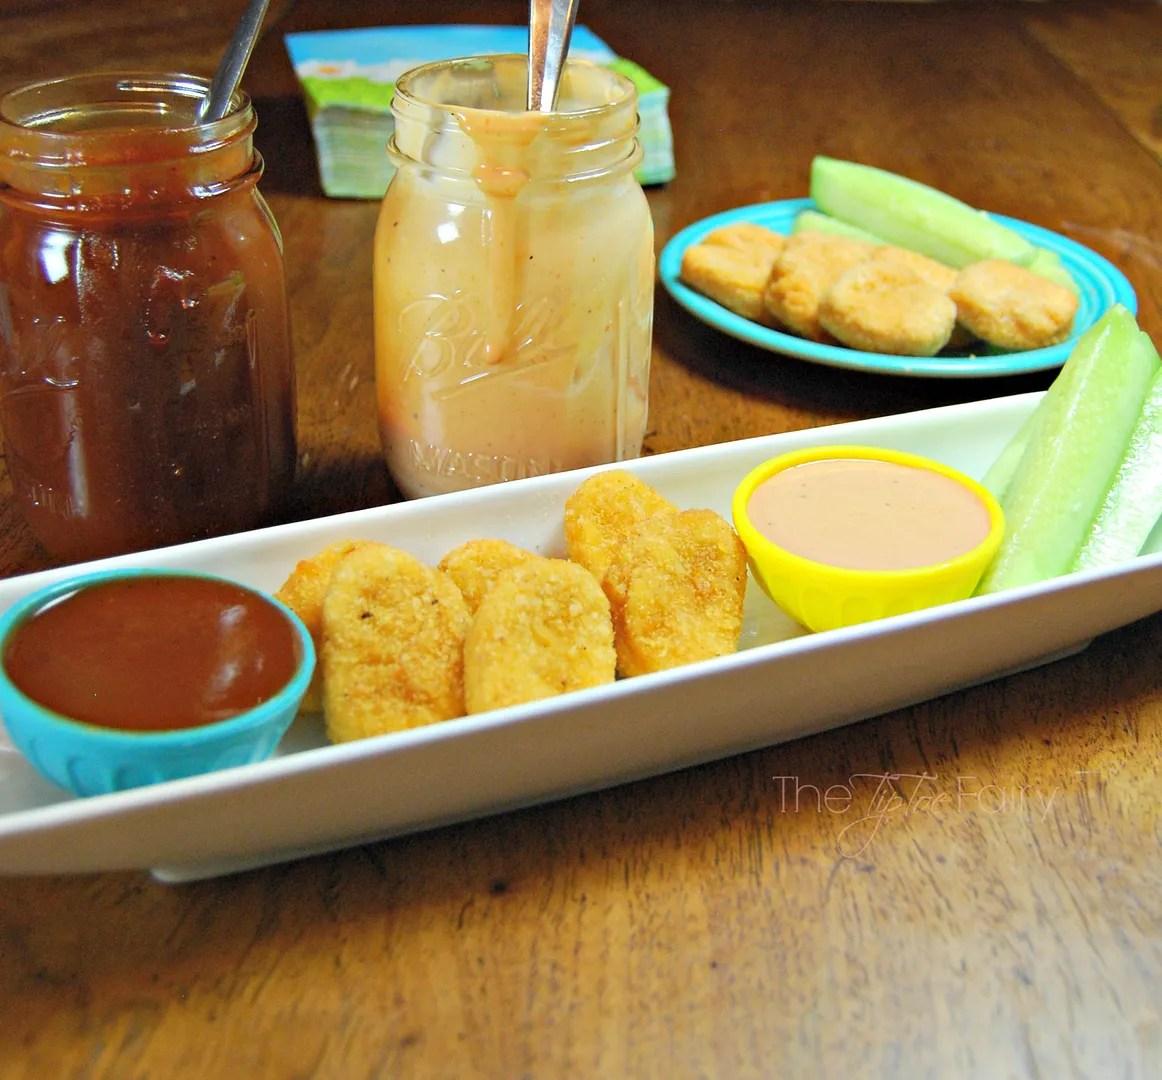 Homemade Dipping Sauces & Summer Snacks #SummerSauce #shop #cbias | The TipToe Fairy